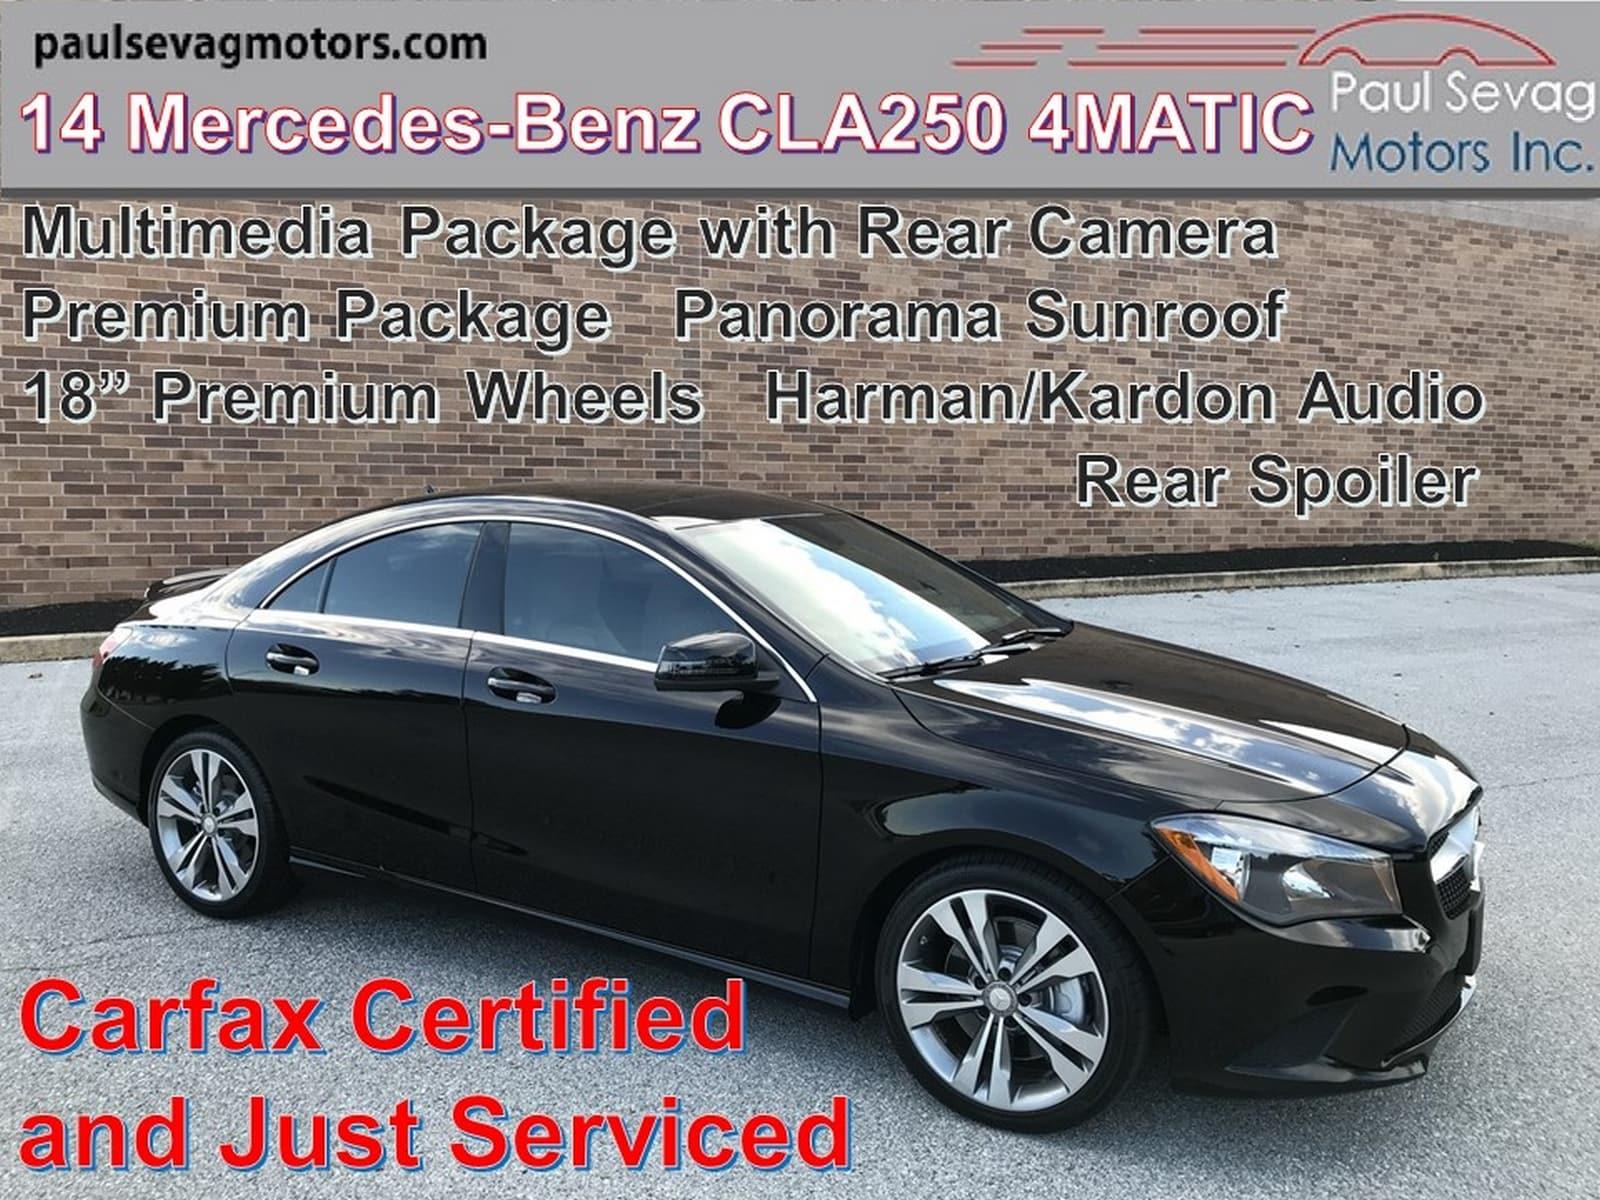 2014 Mercedes-Benz CLA 250 4MATIC Multimedia Pkg/Pano Roof/Premium Wheels/Rear Spoil